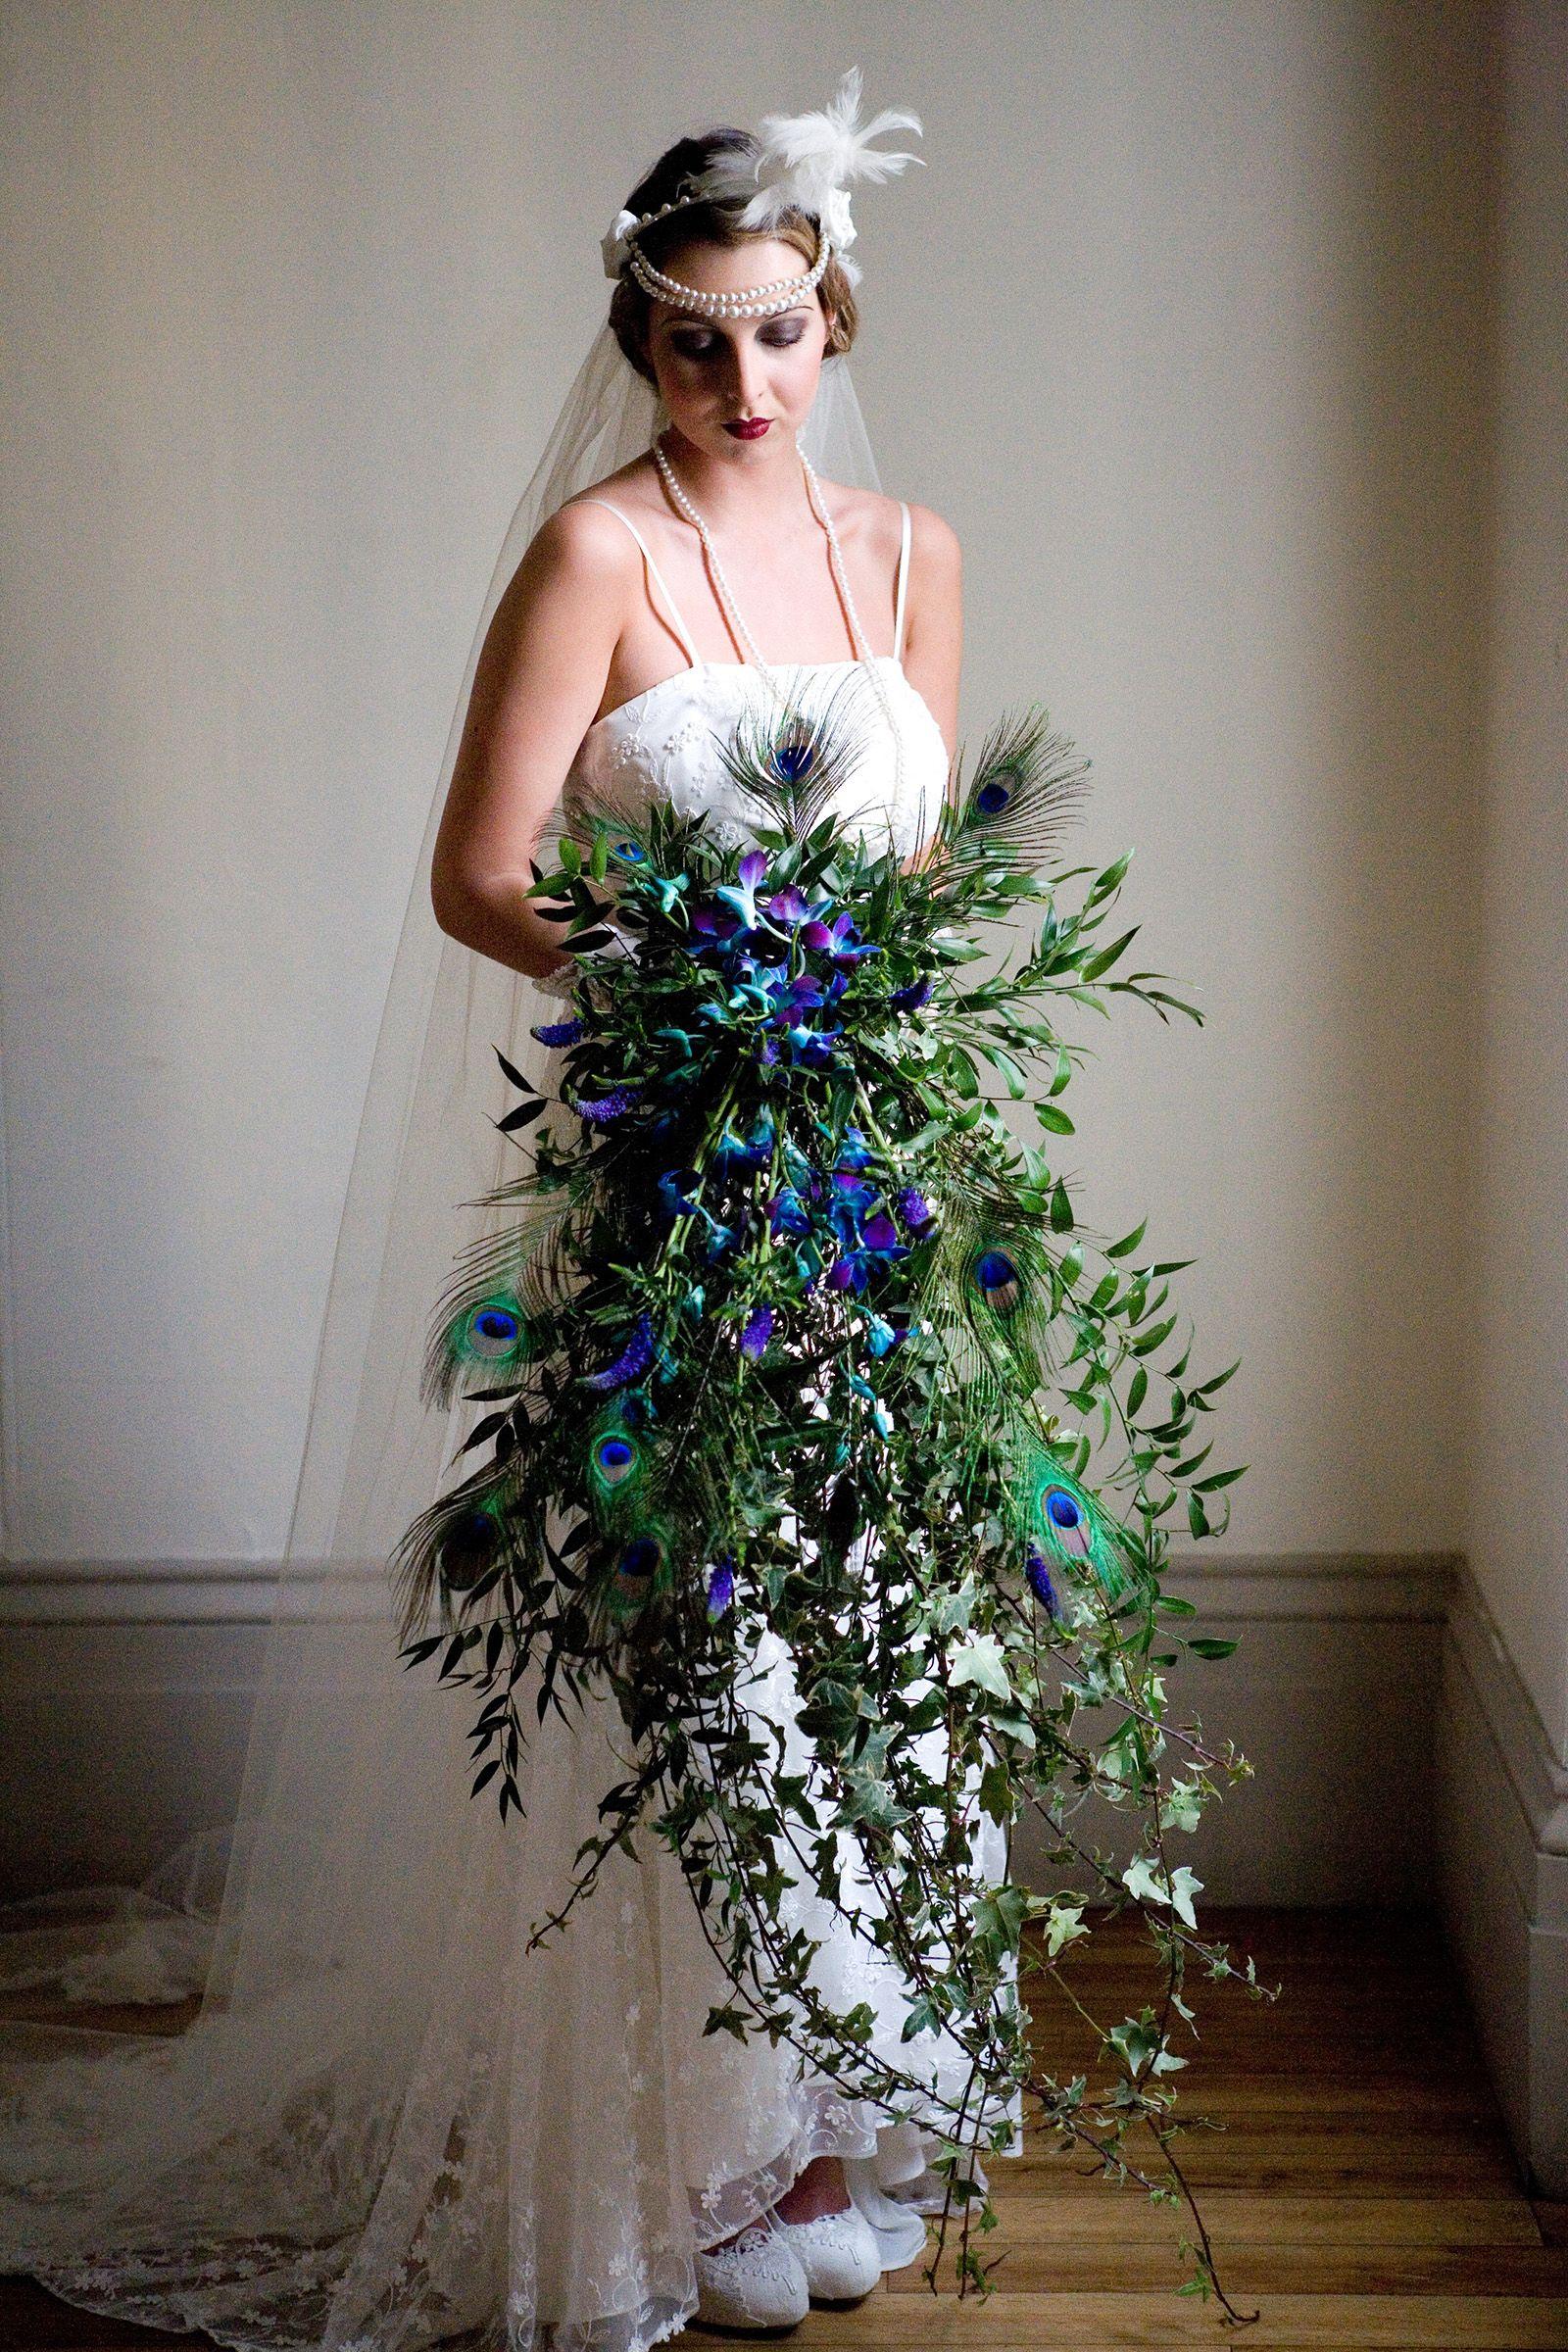 Downton Abbey 1920's style wedding bouquet. Wedding style